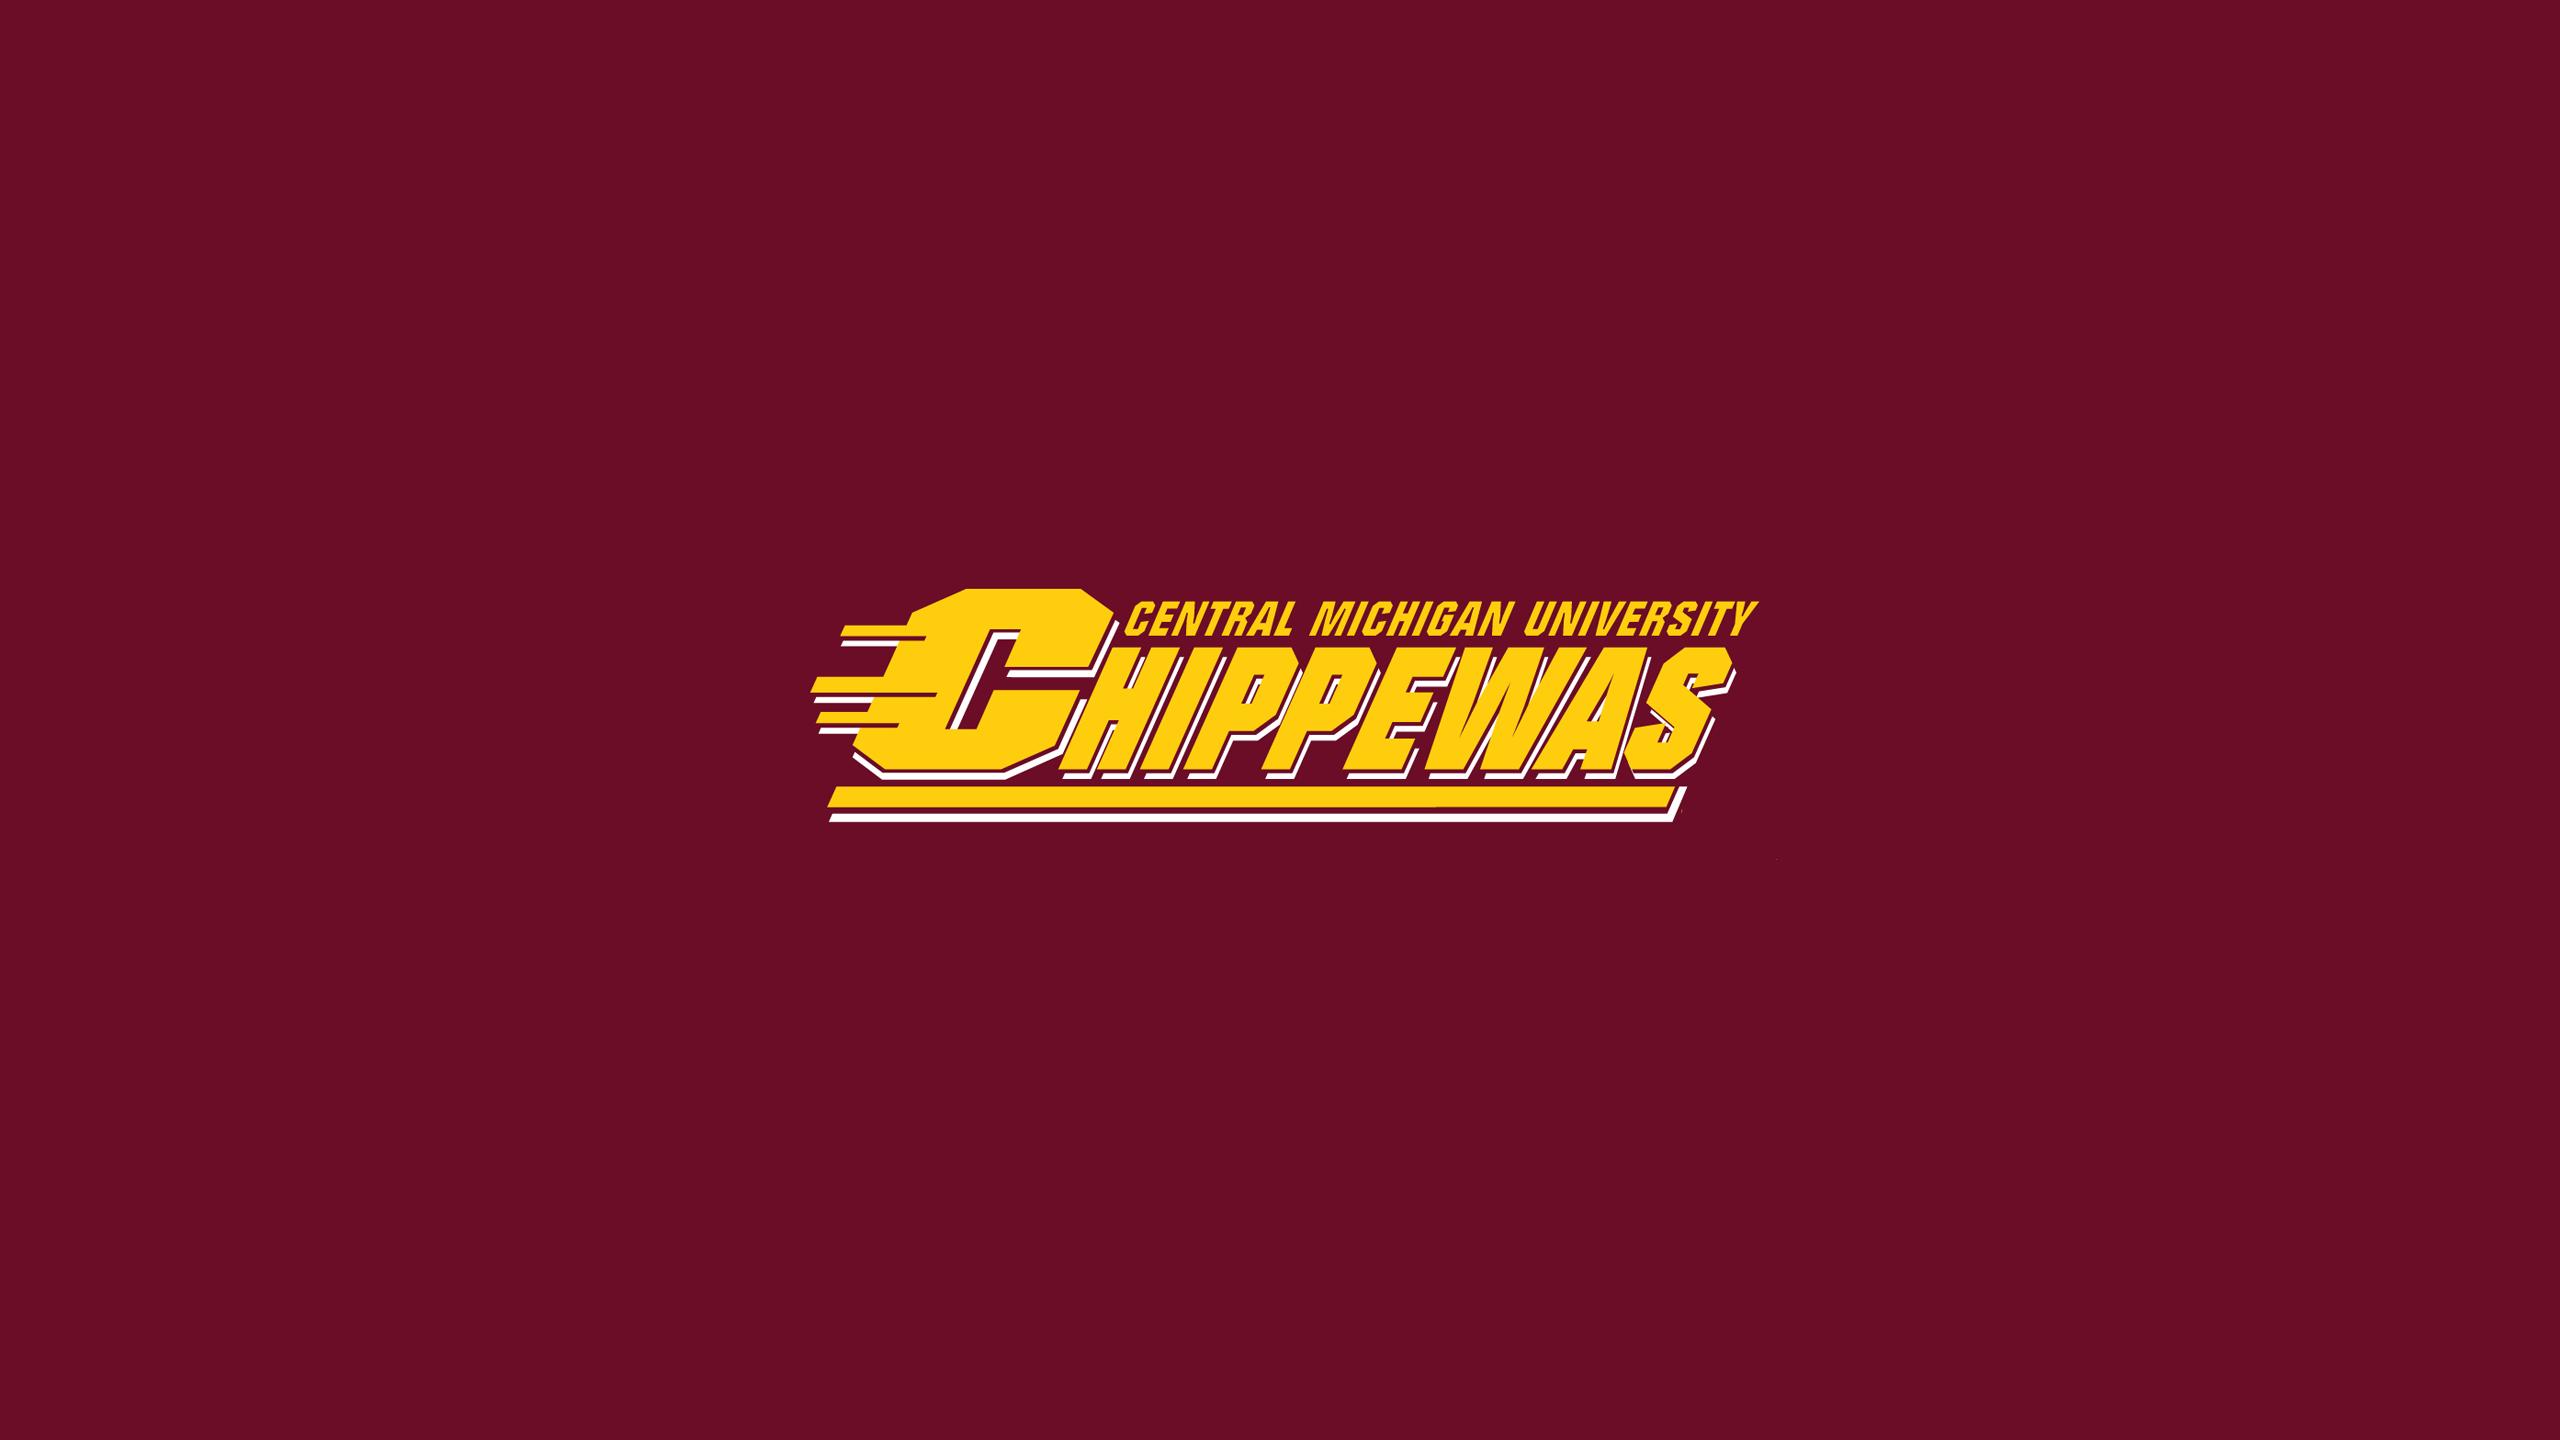 Central Michigan University Chppewas